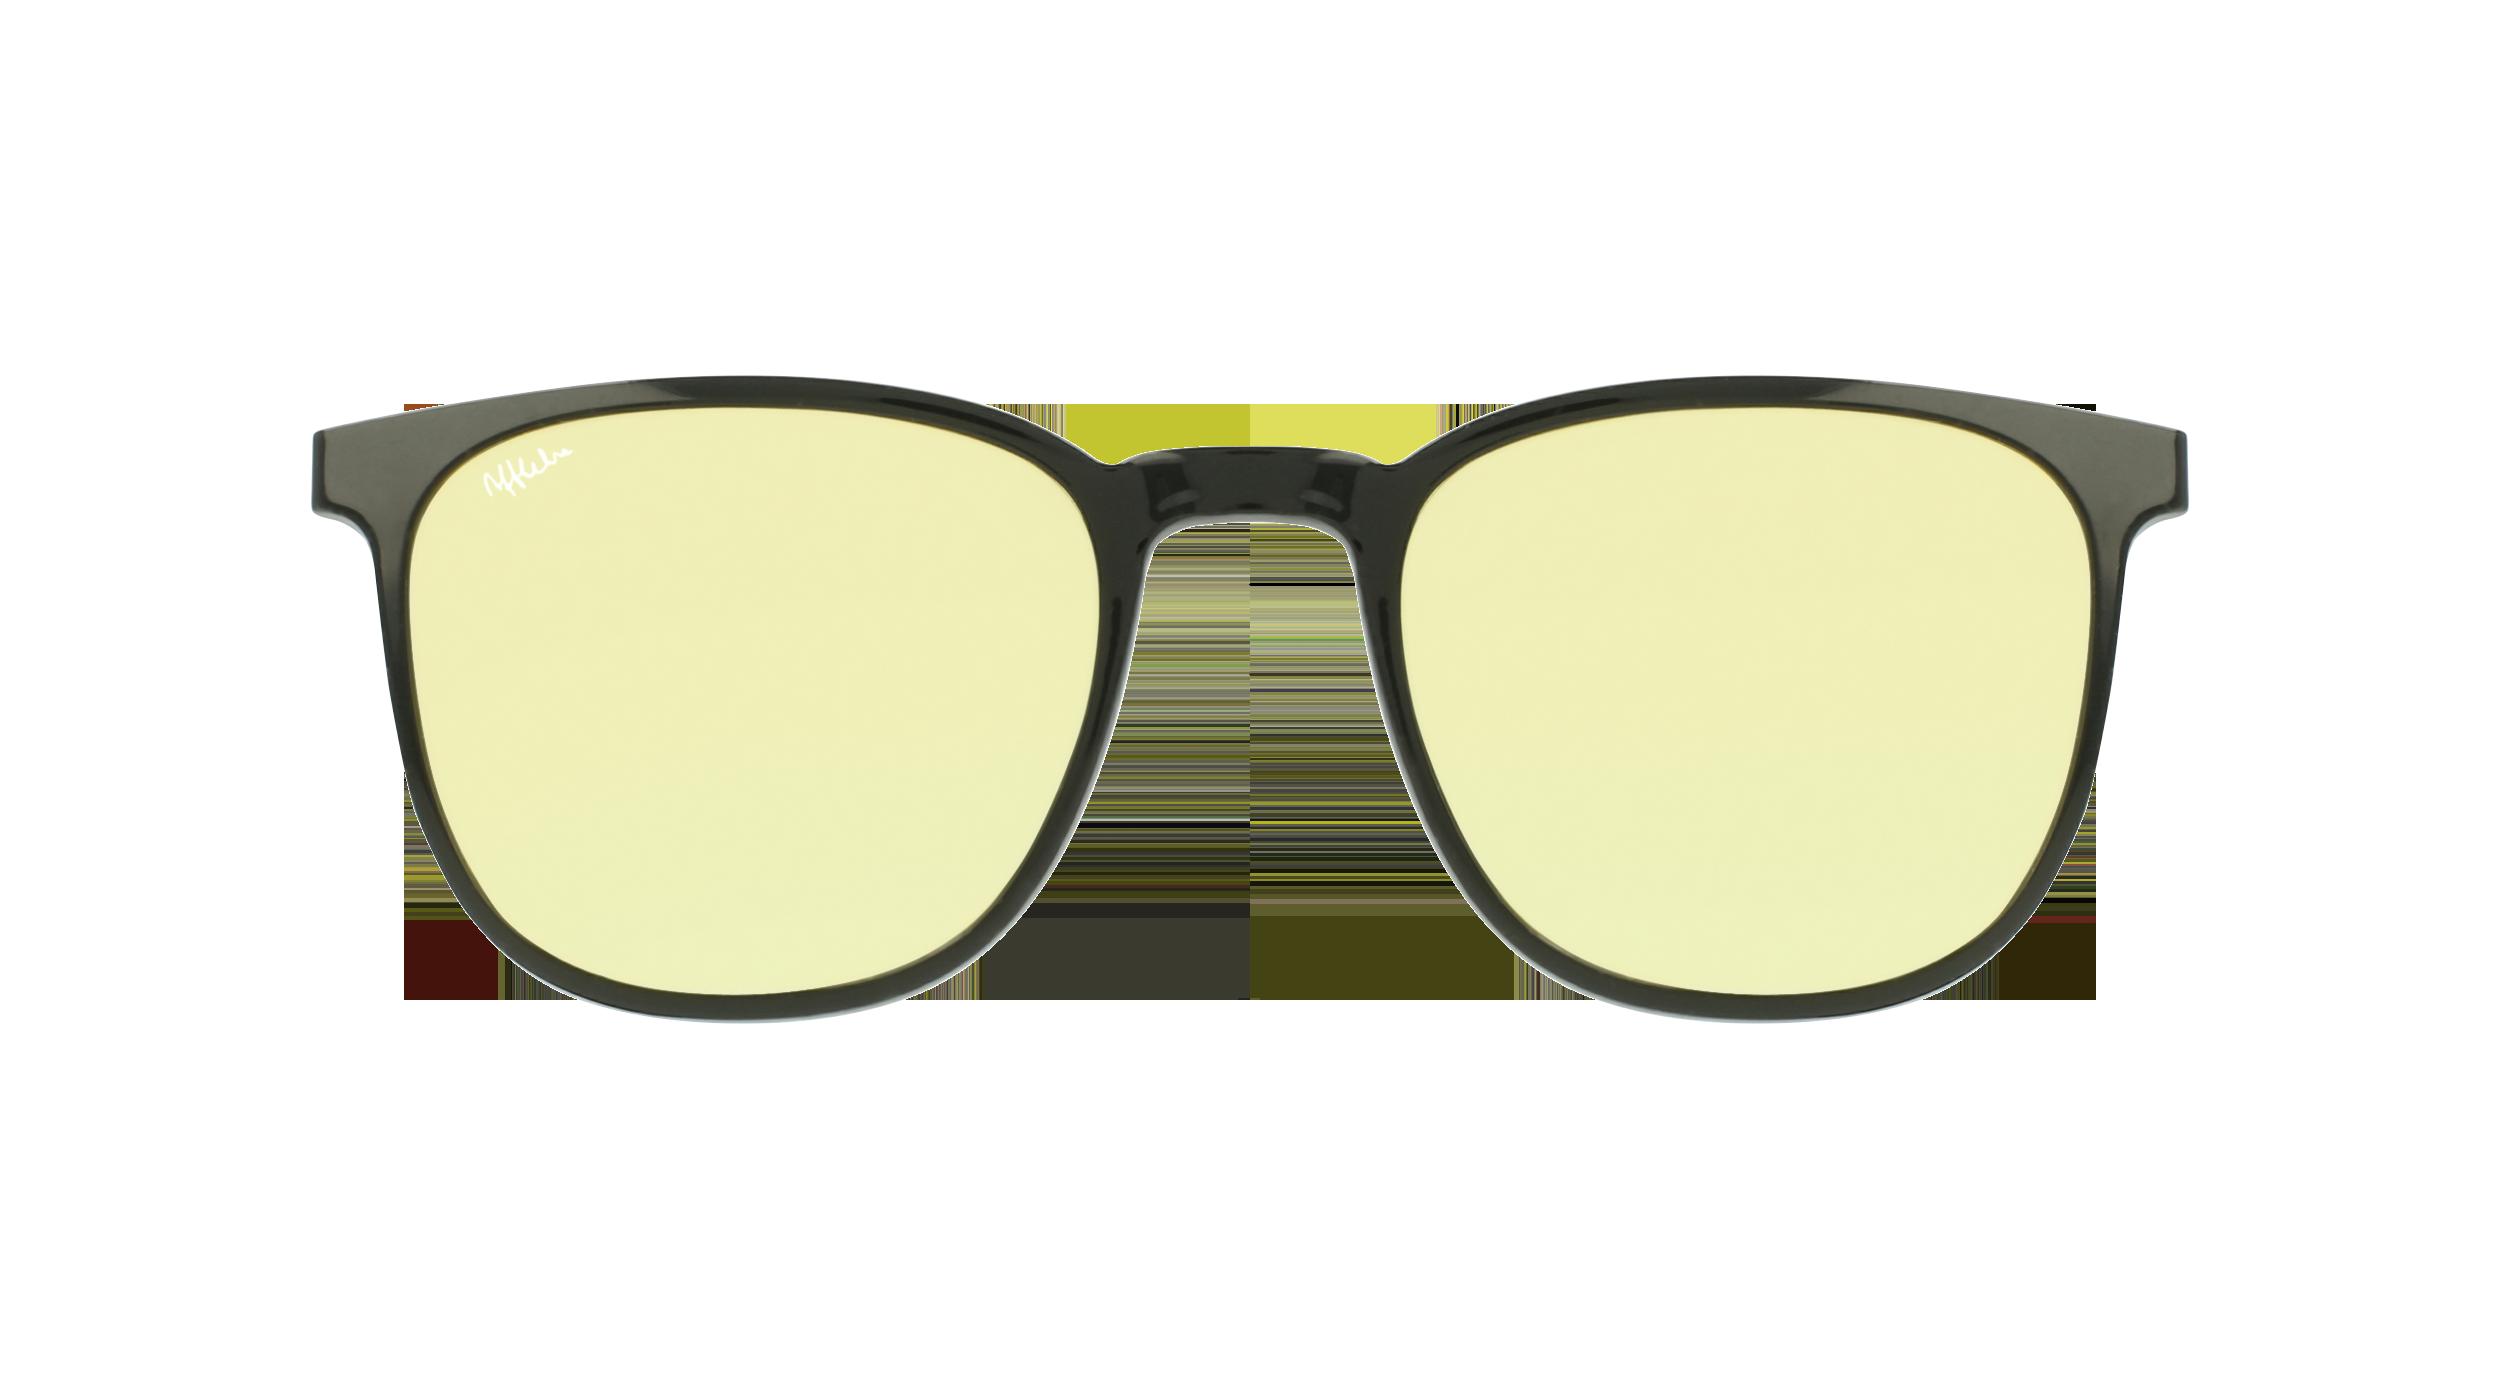 afflelou/france/products/smart_clip/clips_glasses/07630036457375.png